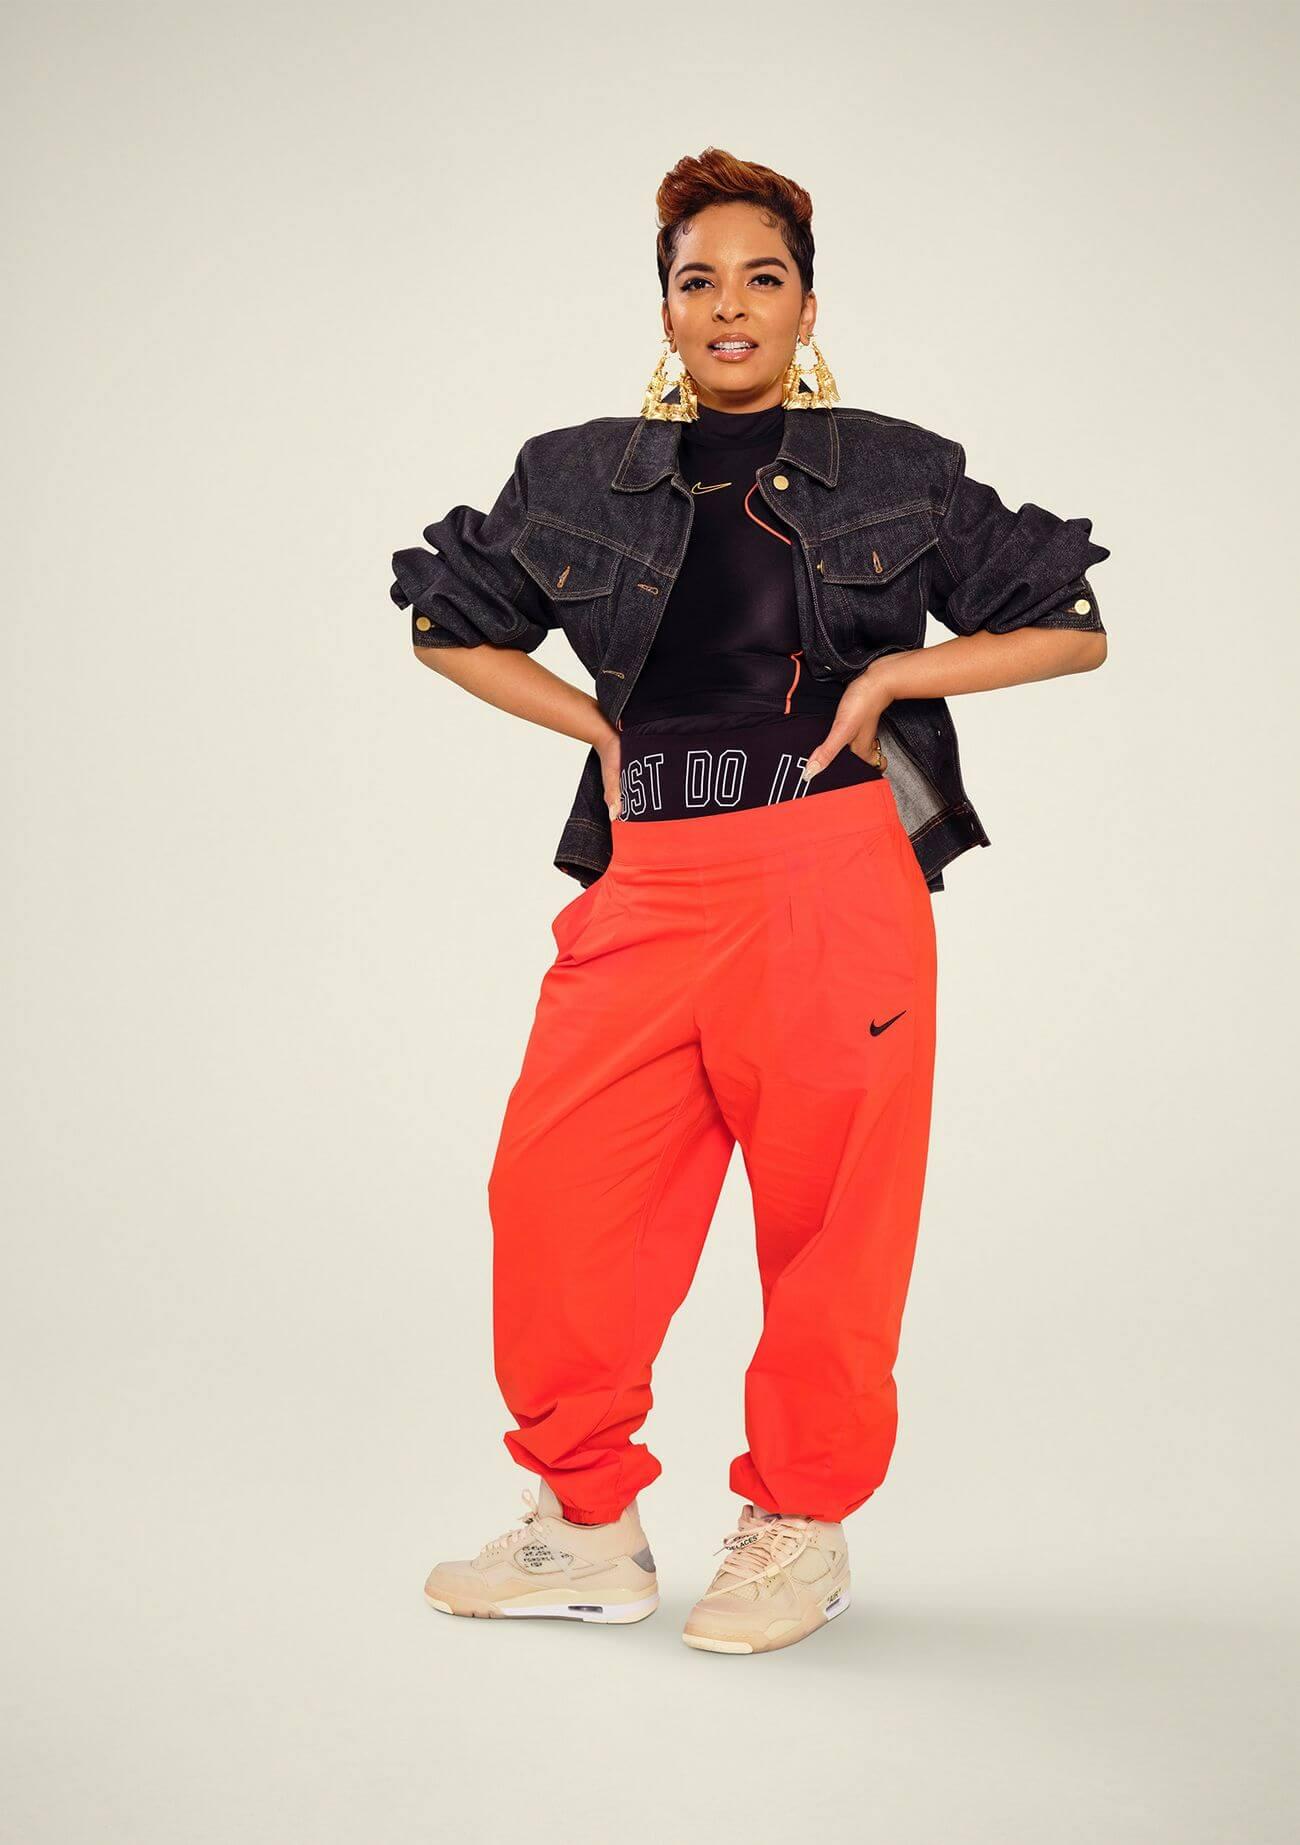 Sheena Wong Shue, Graphics /Serena Williams Design Crew (SWDC)